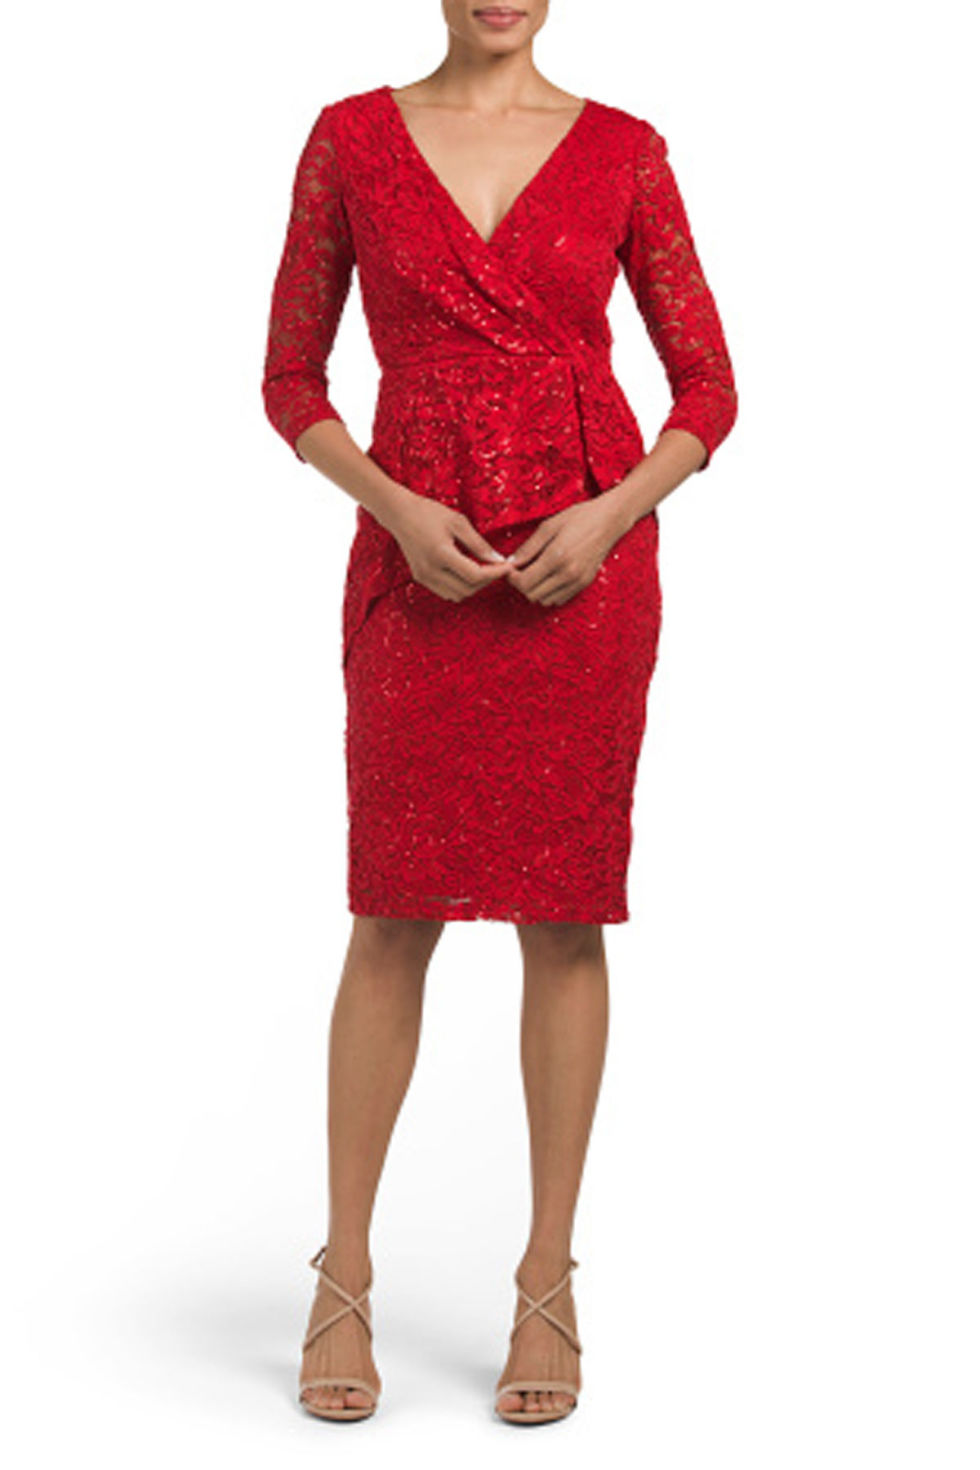 15 Pretty Valentine's Day Dresses Under $50 - Date Night Dresses ...